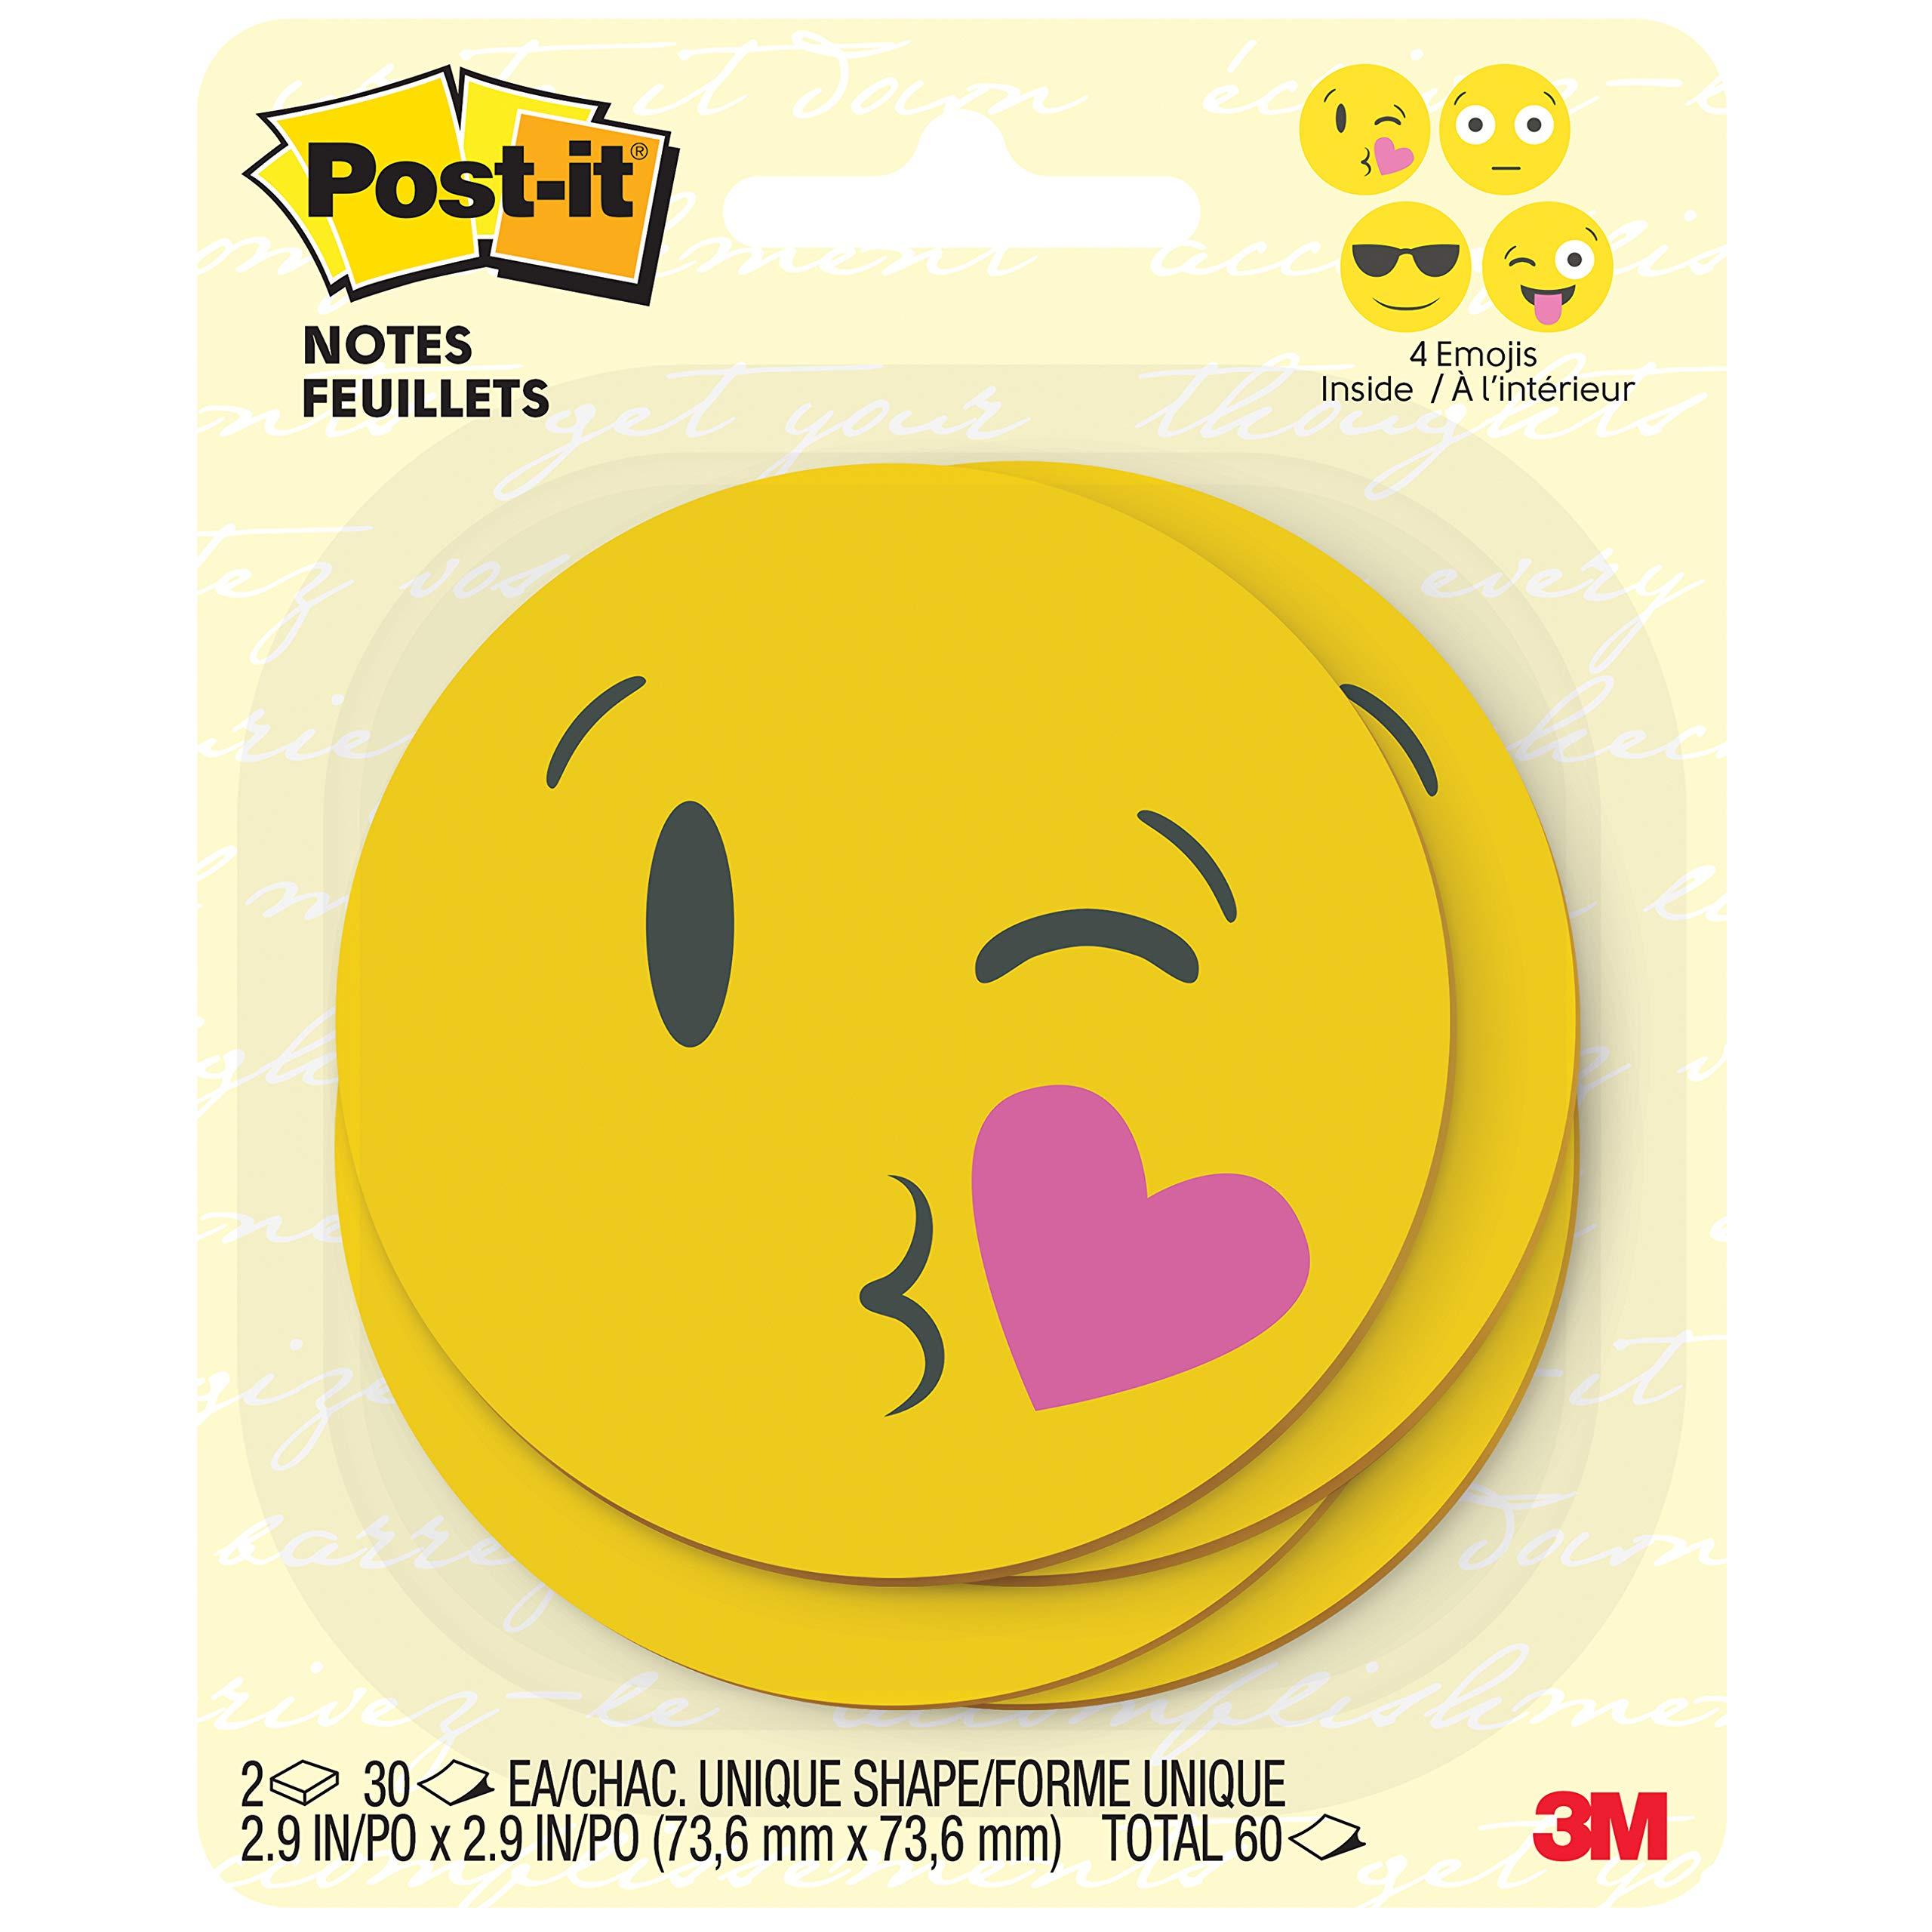 Post-it Printed Notes, 2 Pads/Pack, 30 Sheets/Pad, 3x3 in, Emoji designs, 4 alternating faces (BC-2030-EMOJI) , Yellow